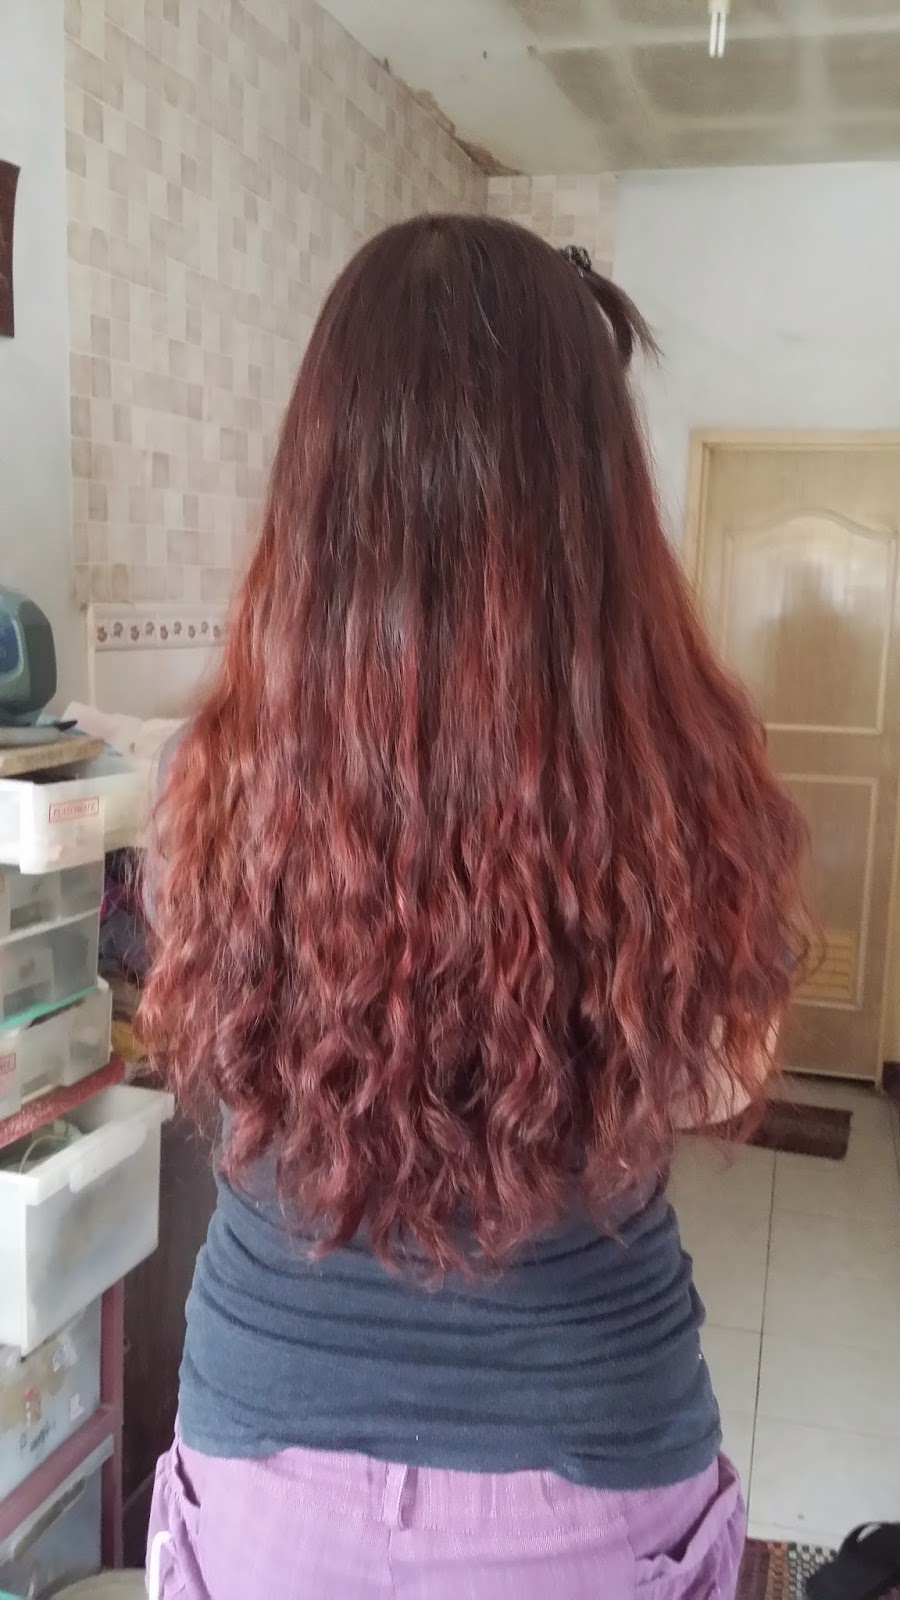 Lakwatserang Bulakenya: Kolours Hair Dye